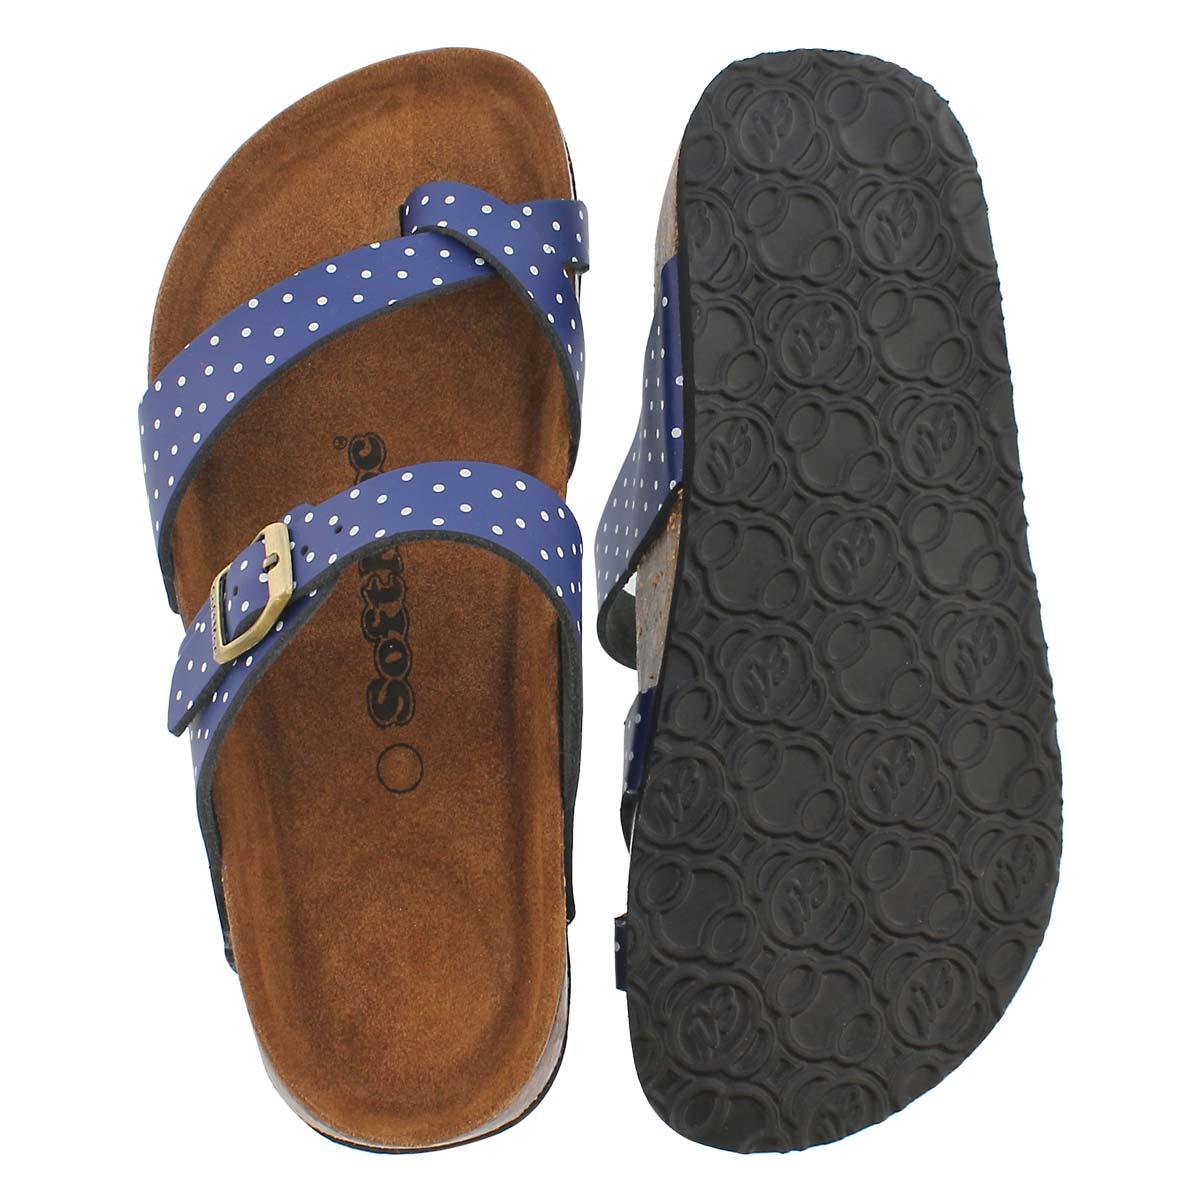 Lds Alicia 5 nvy/wt memory foam sandal